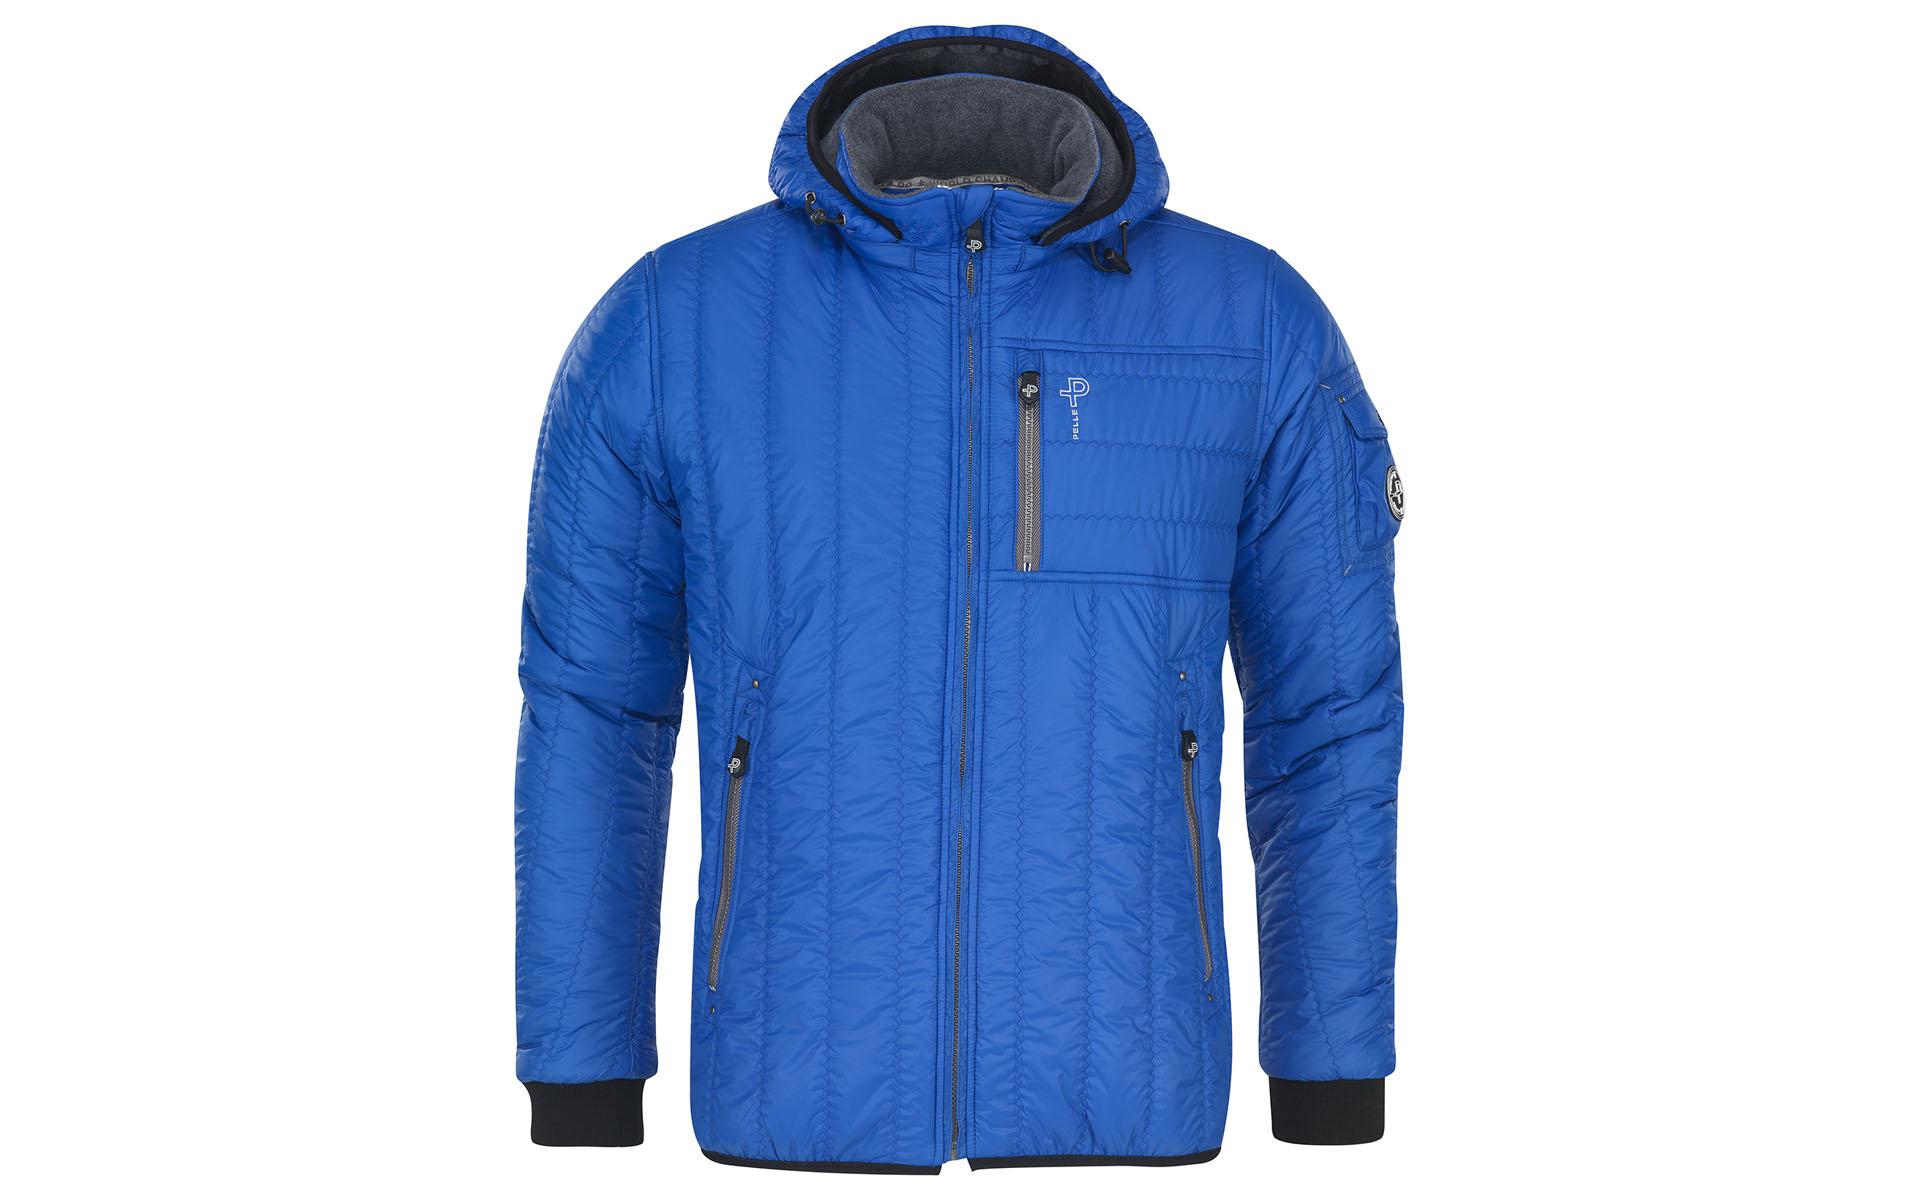 Pelle P Mistral Jacket 3.0